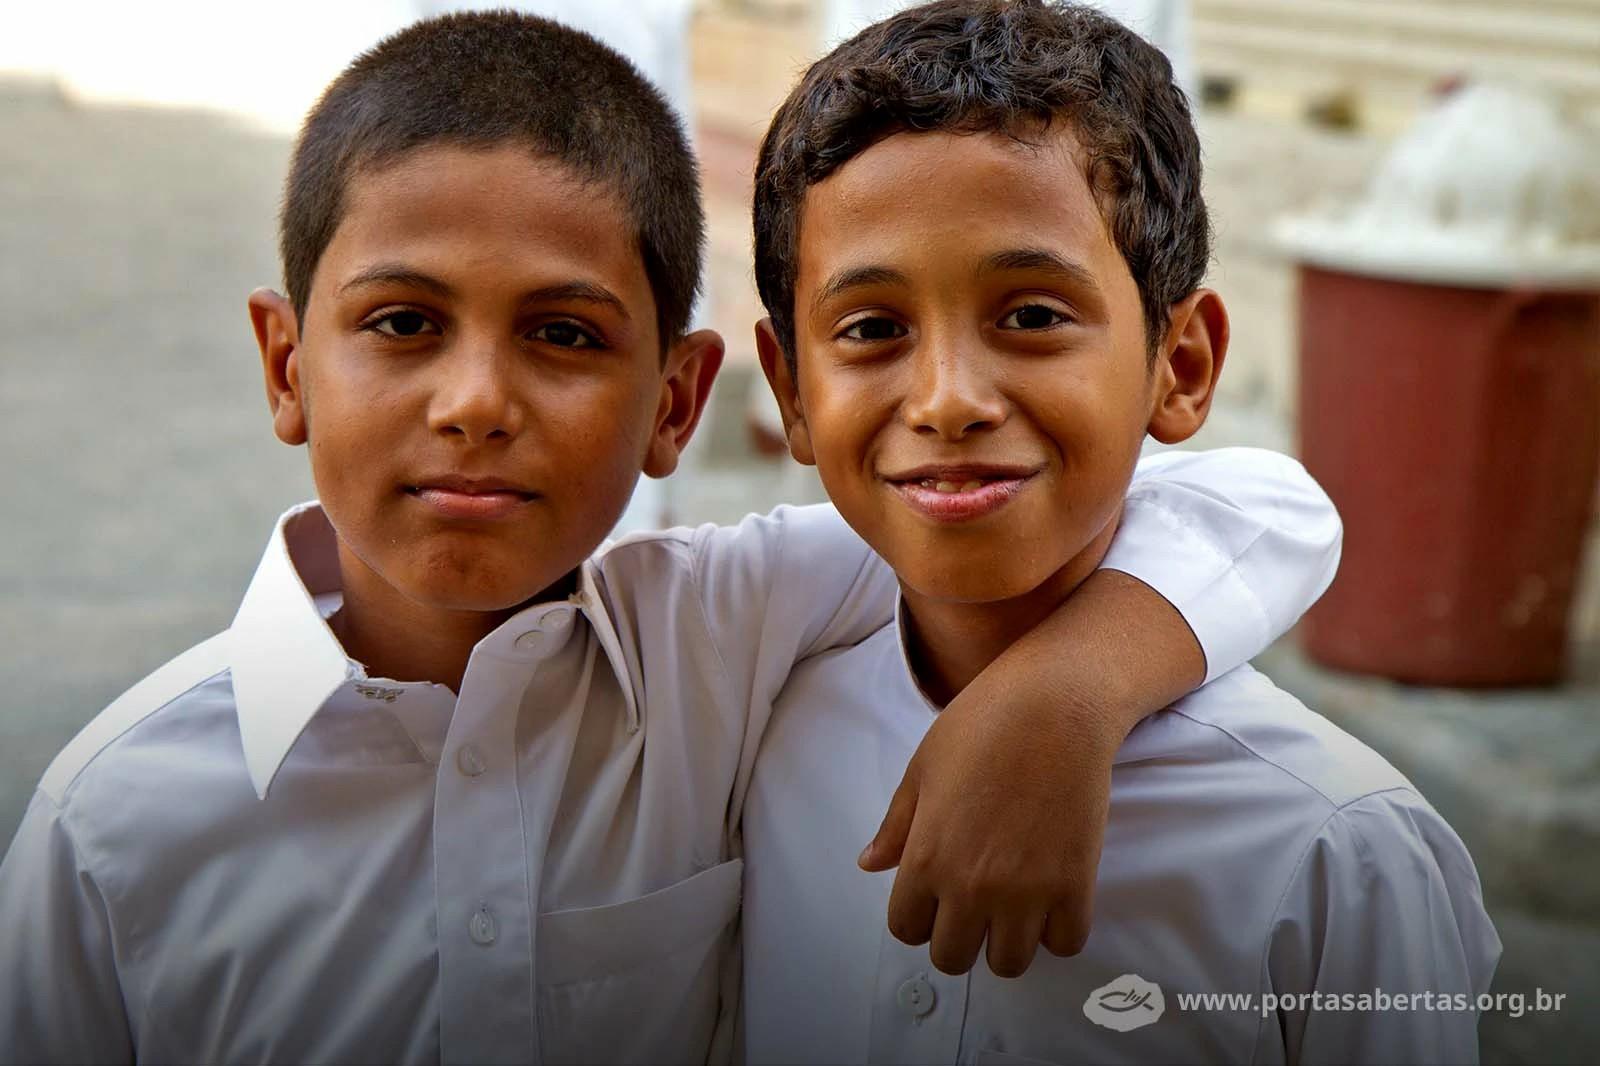 Segundo observadores, a presença cristã nativa na Arábia Saudita está aumentando